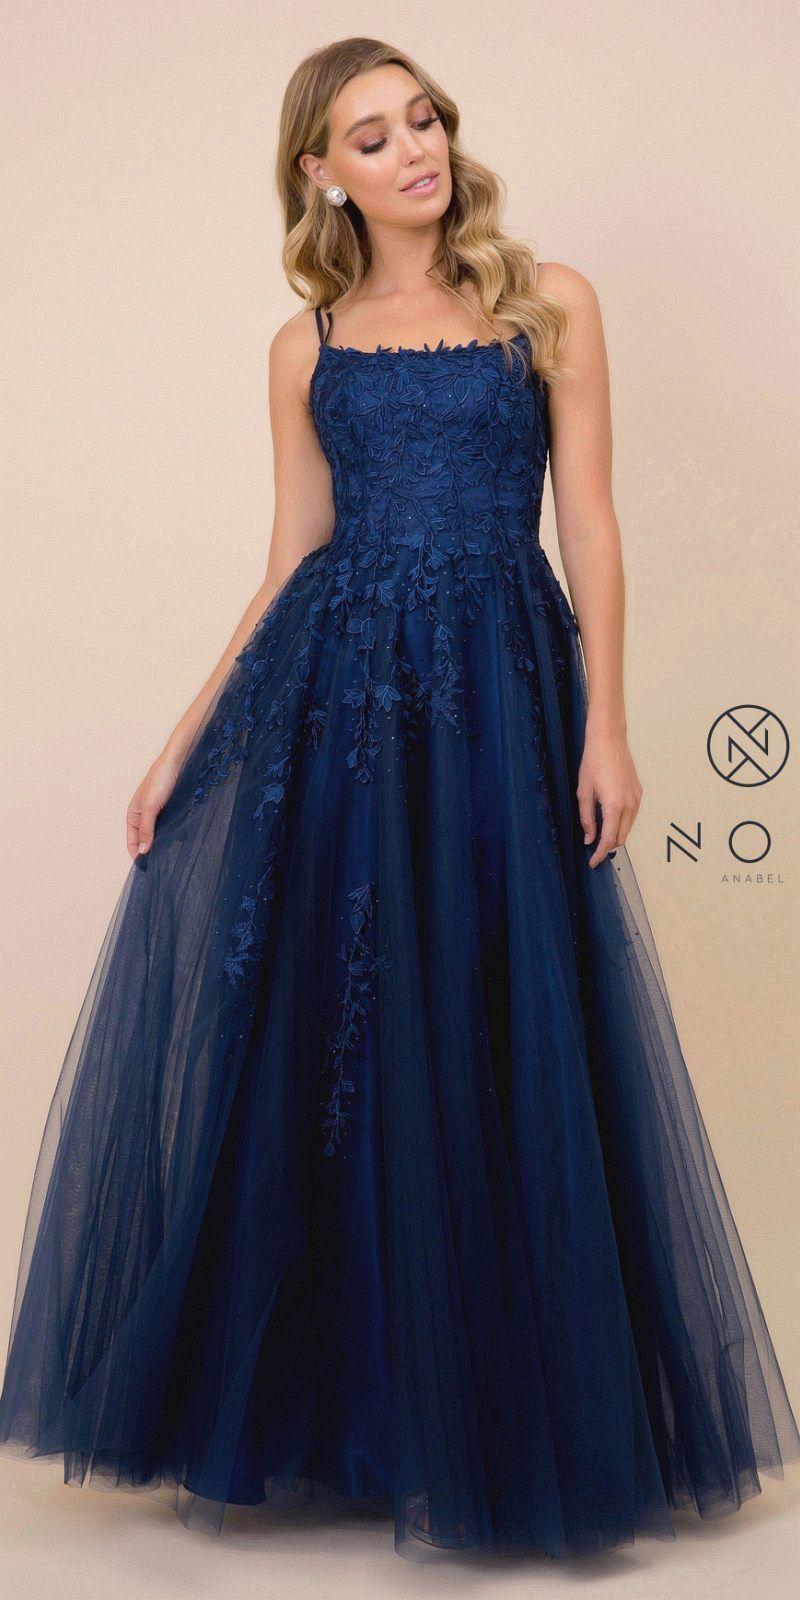 Lace Up Back Appliqued Long Prom Dress Navy Blue Navy Prom Dresses Pretty Prom Dresses Cute Prom Dresses [ 1600 x 800 Pixel ]